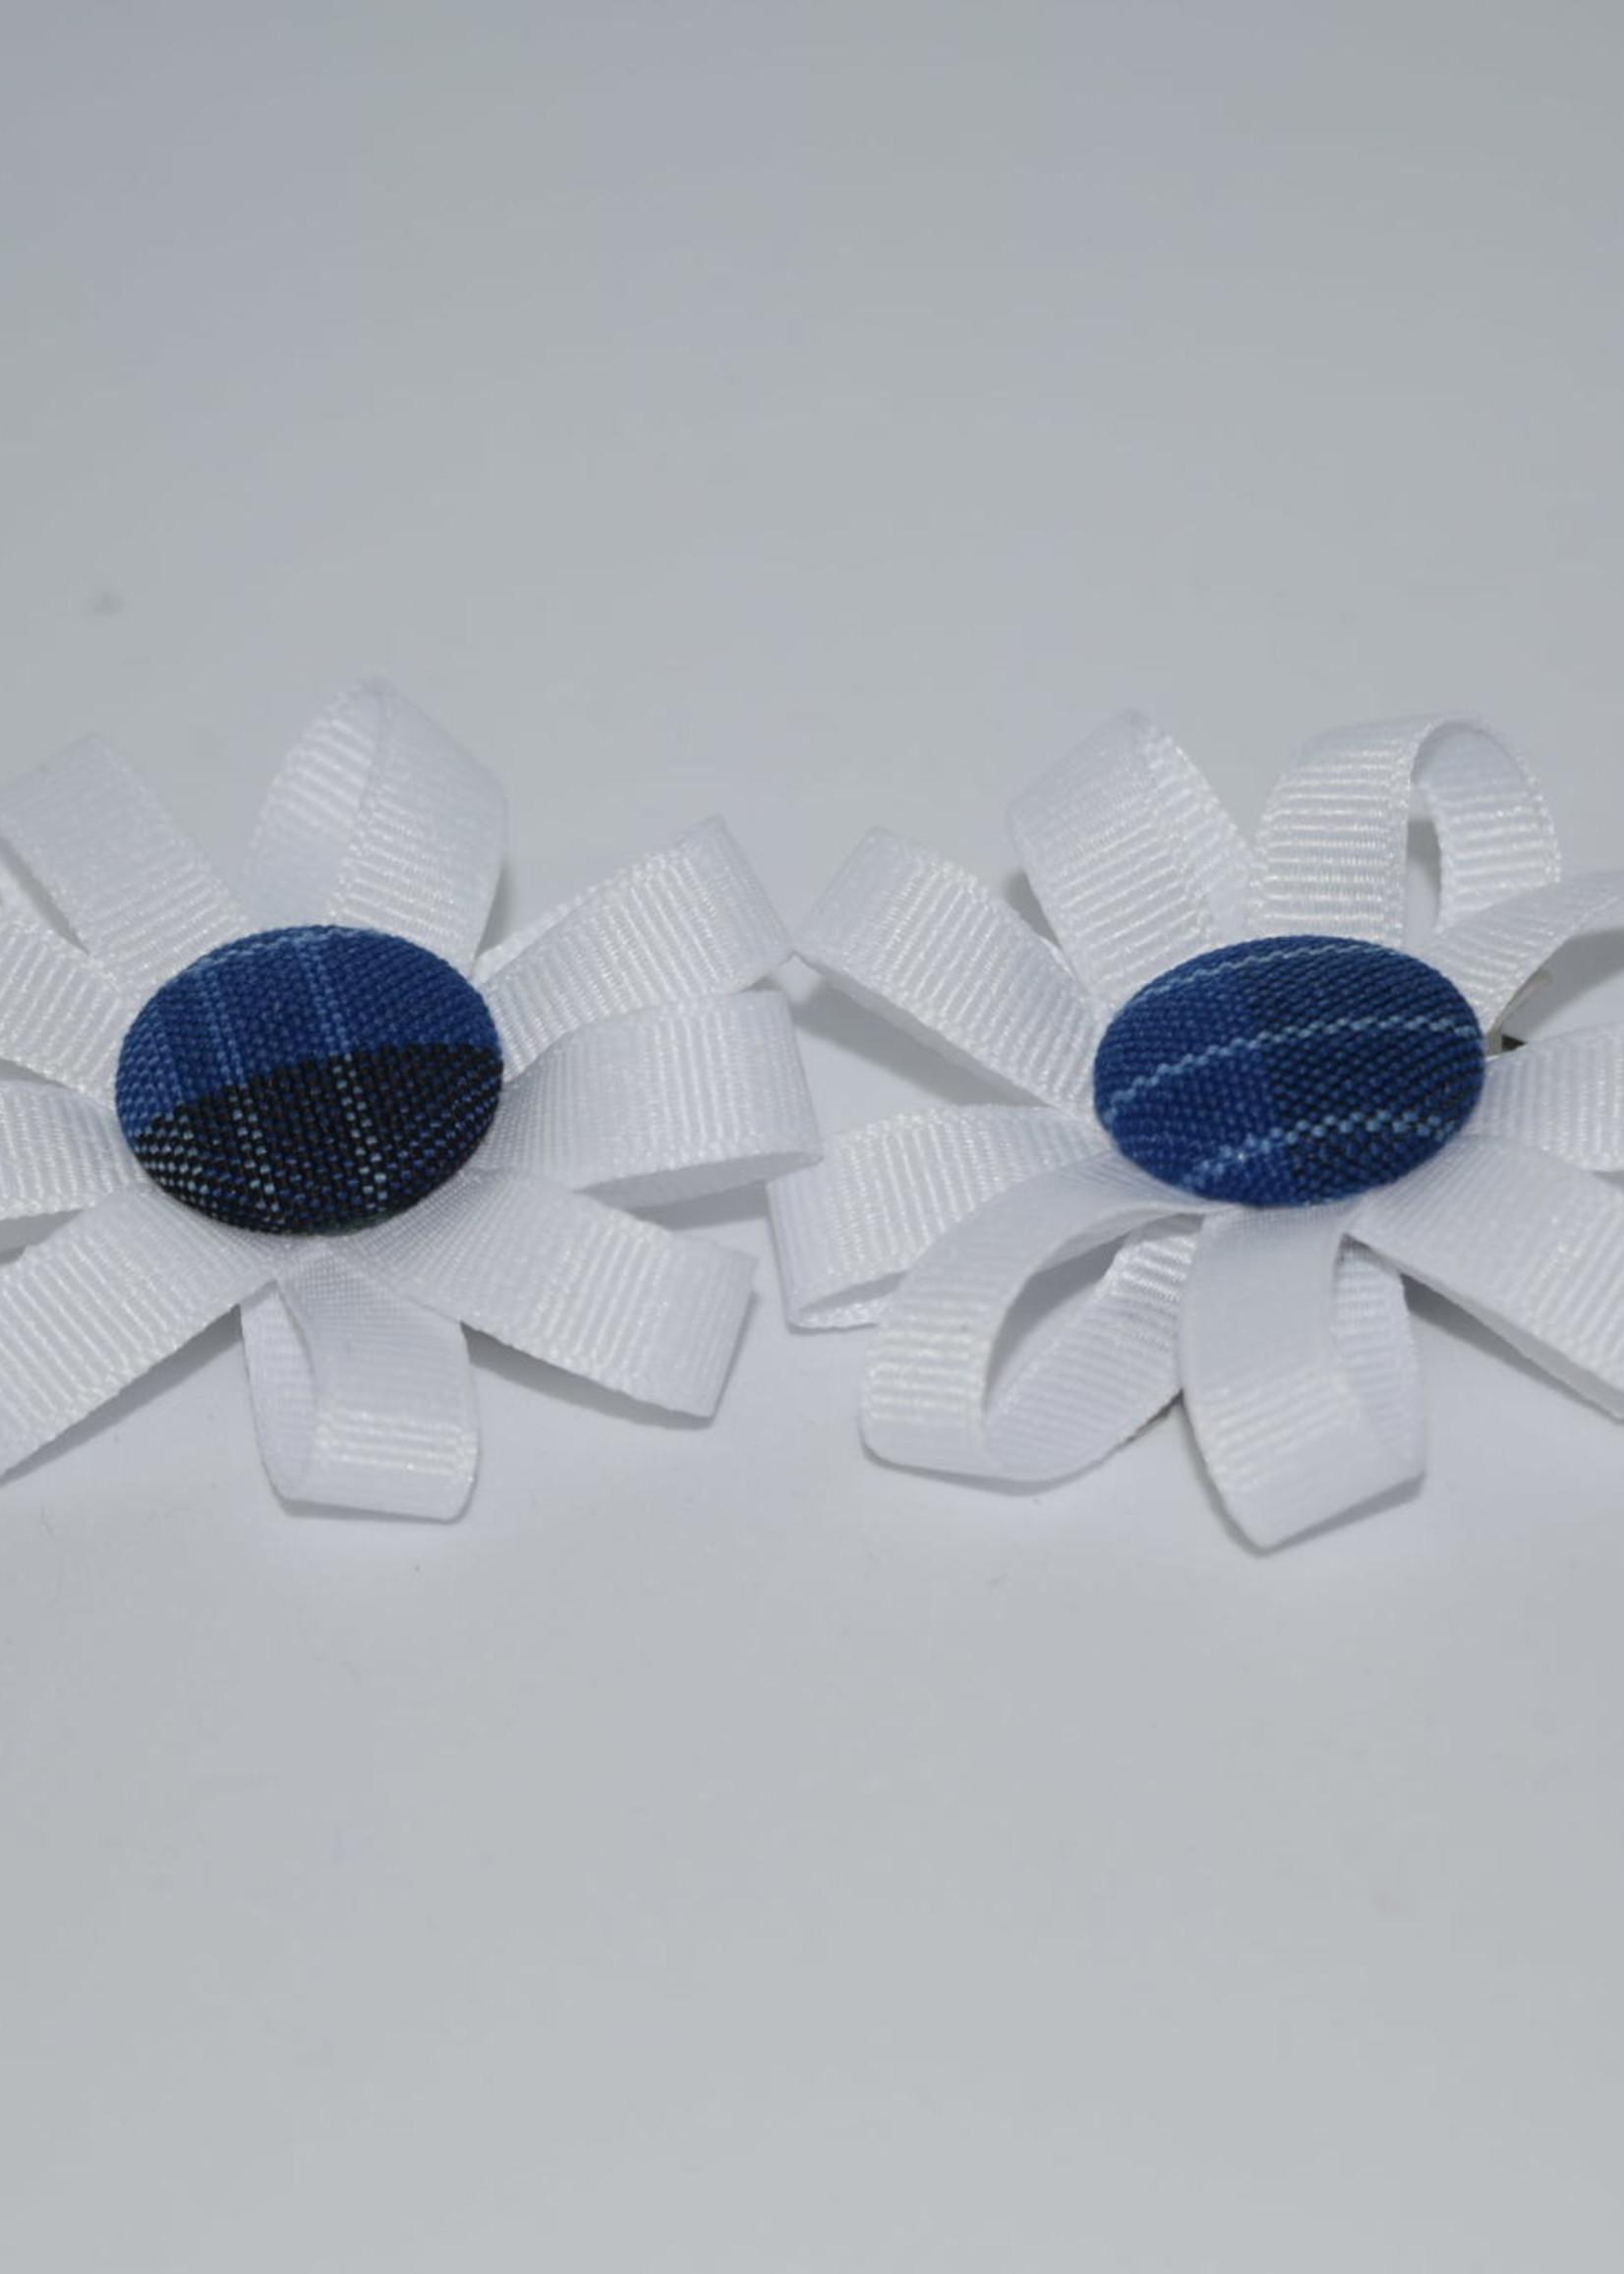 EDT Round Pigtail Ribbon Botton Bows w/plaid center P46 WHT